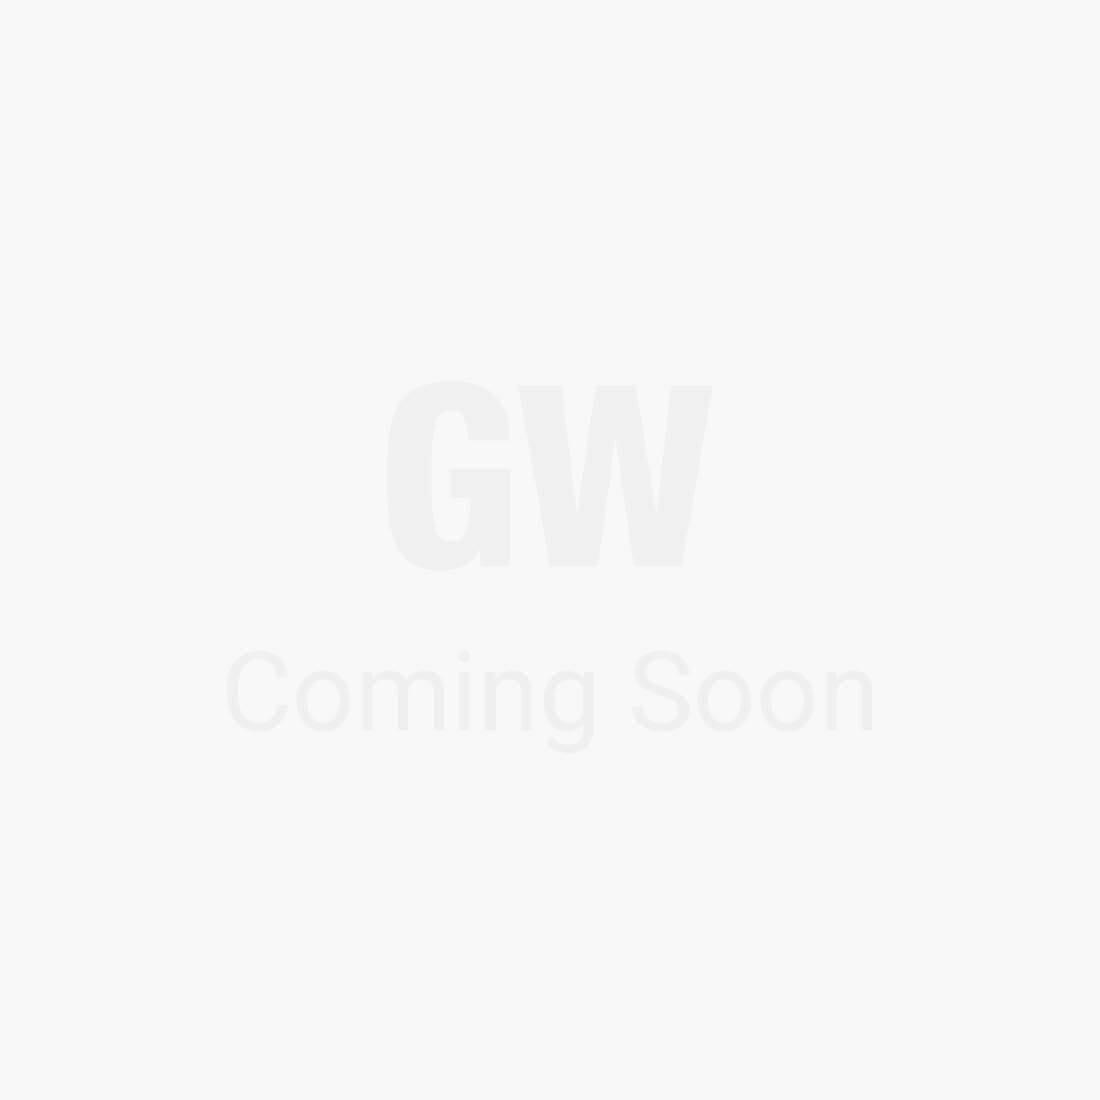 Positano Woven 3 Seater Sofa